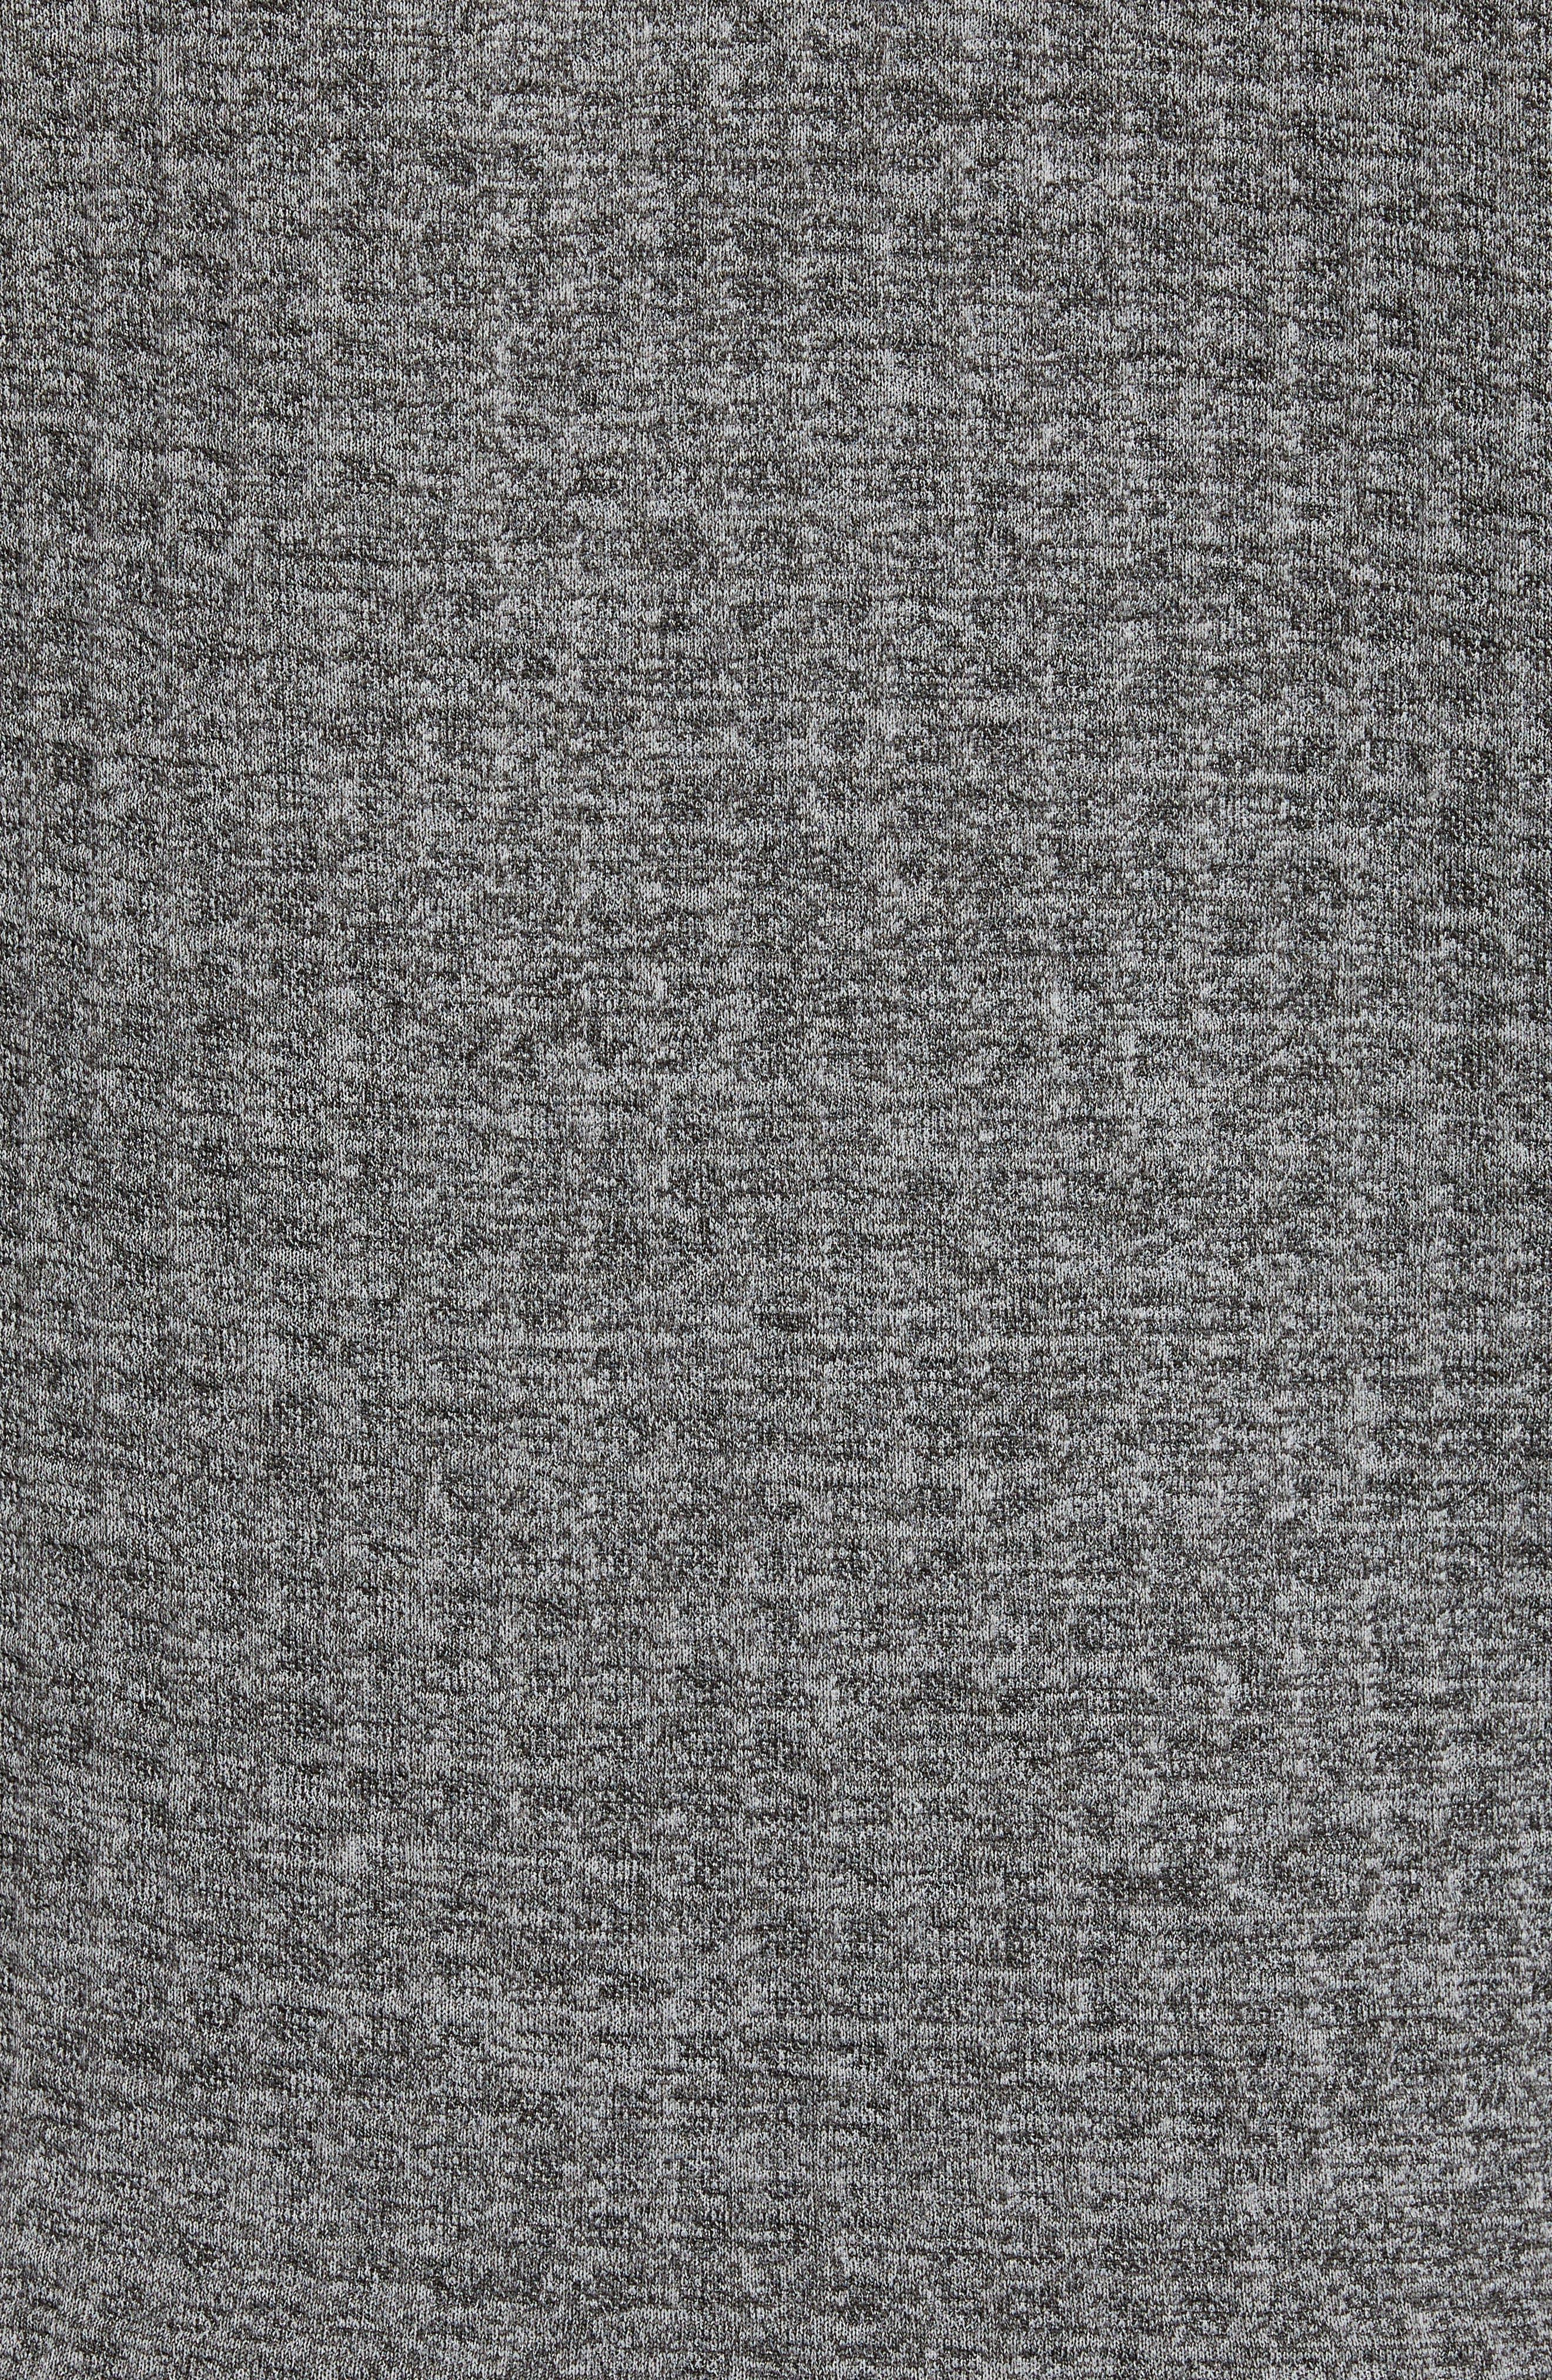 Slim Fit Funnel Neck Sweatshirt,                             Alternate thumbnail 6, color,                             GREY